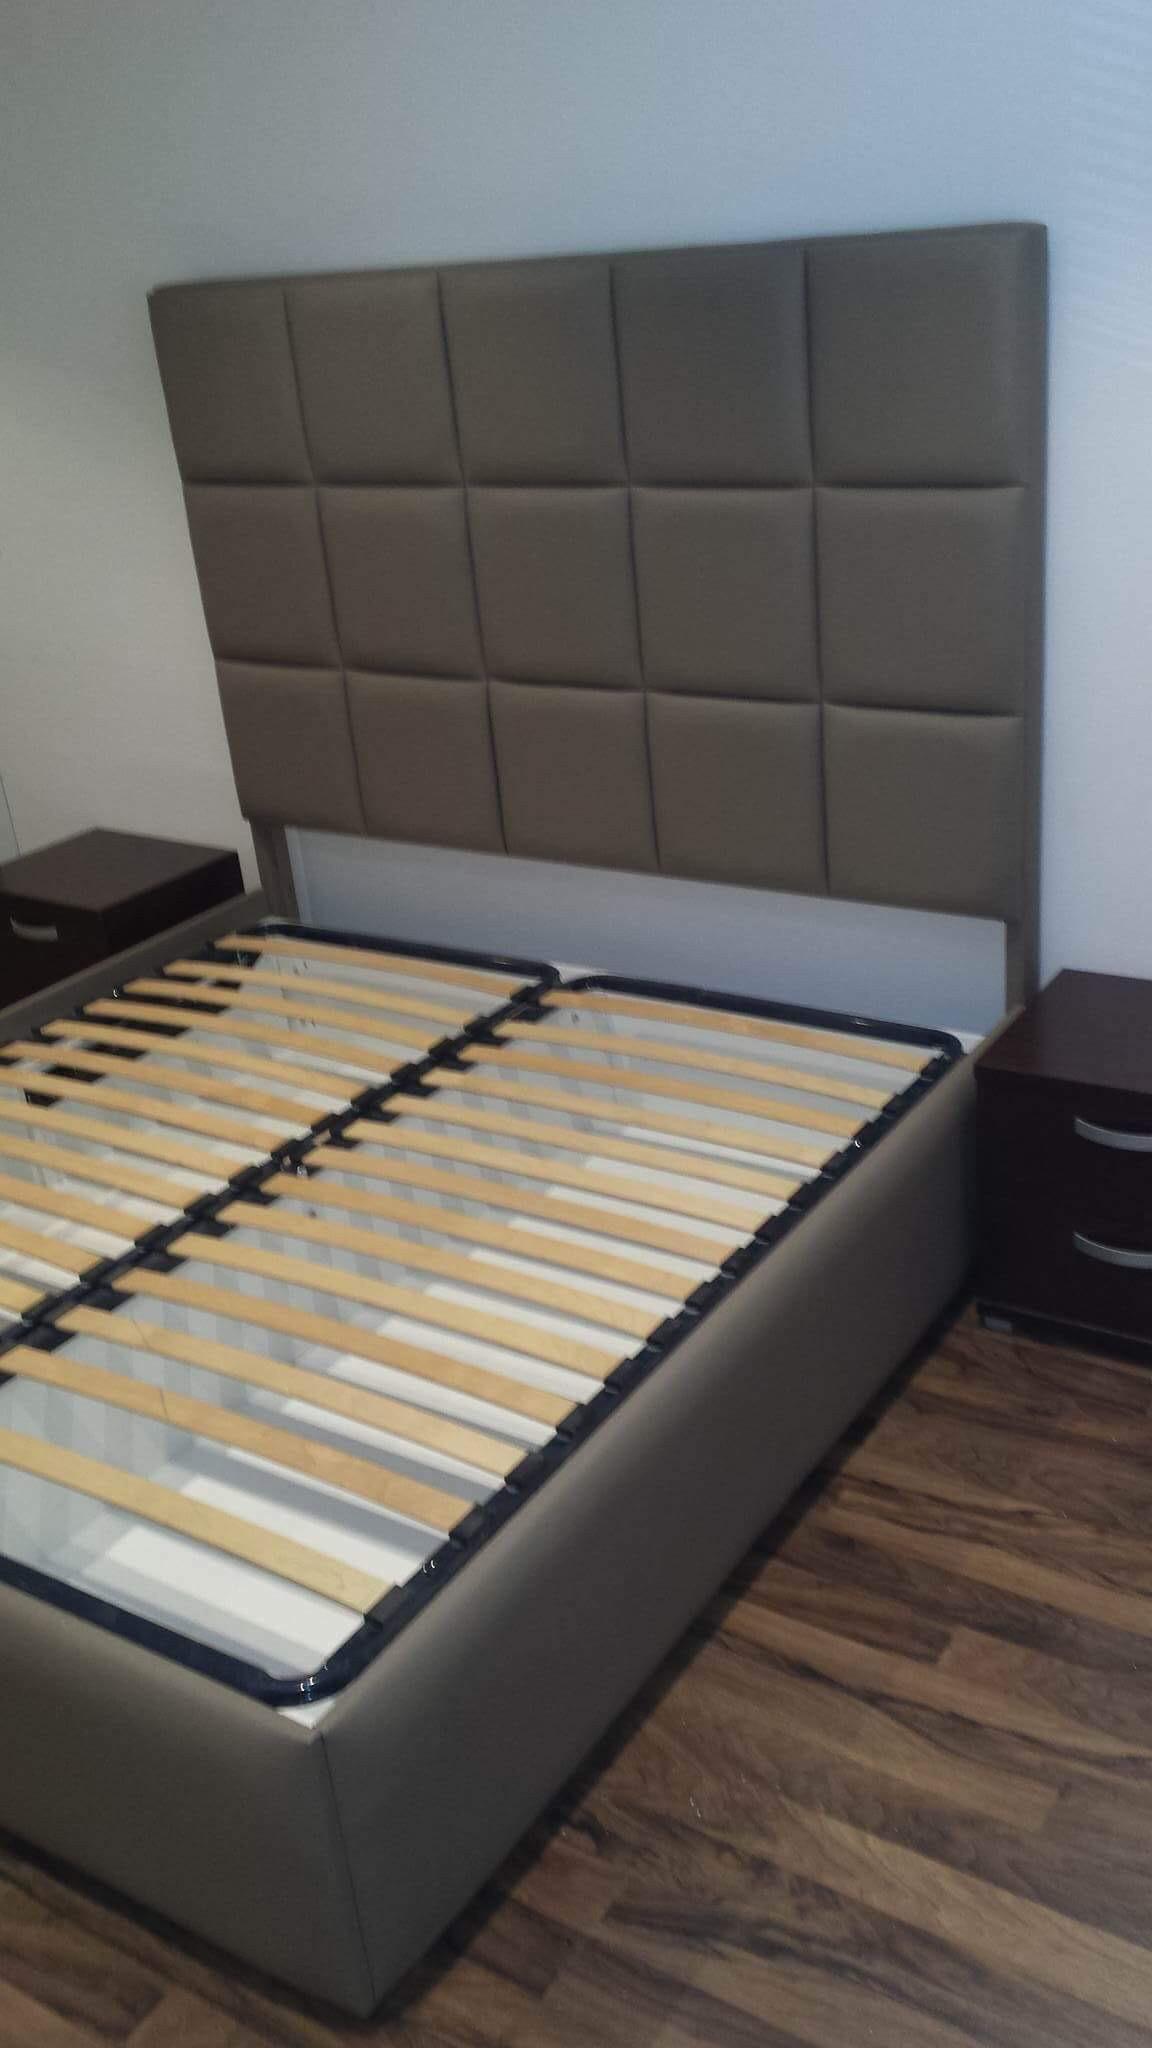 Bed Headboards – Joe Upholstery